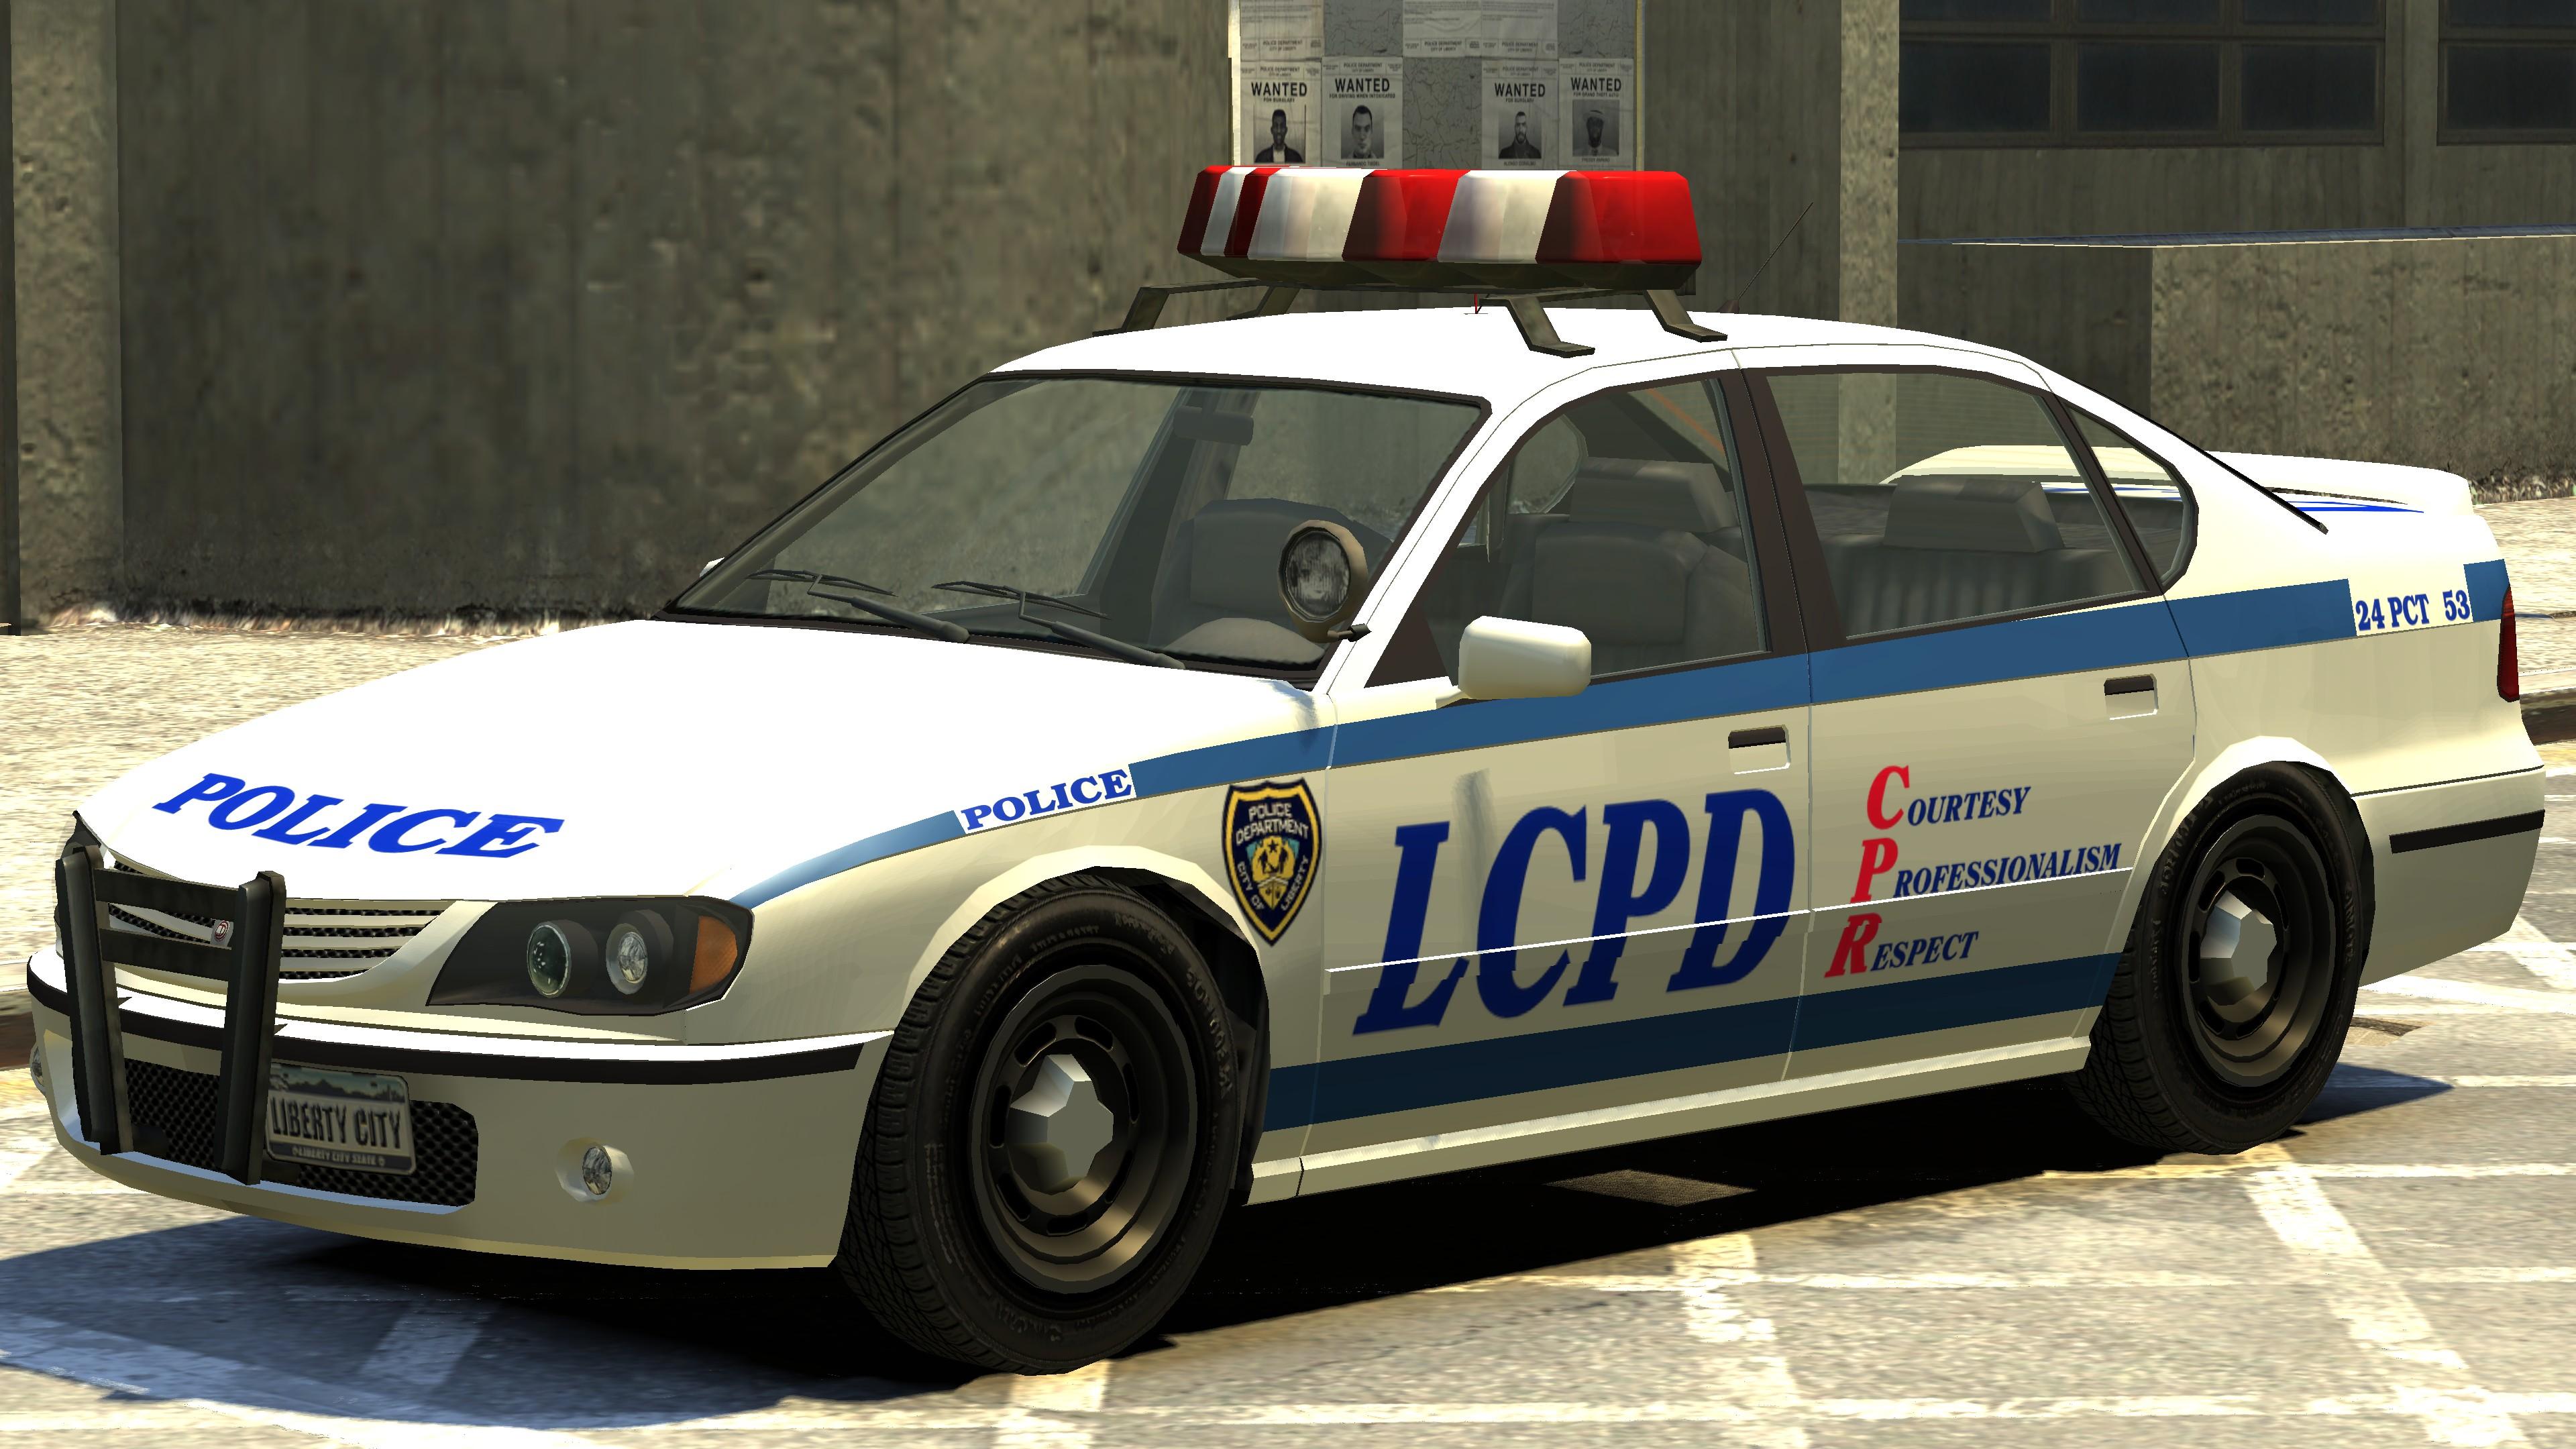 Gta Papercraft Police Patrol Gta Wiki